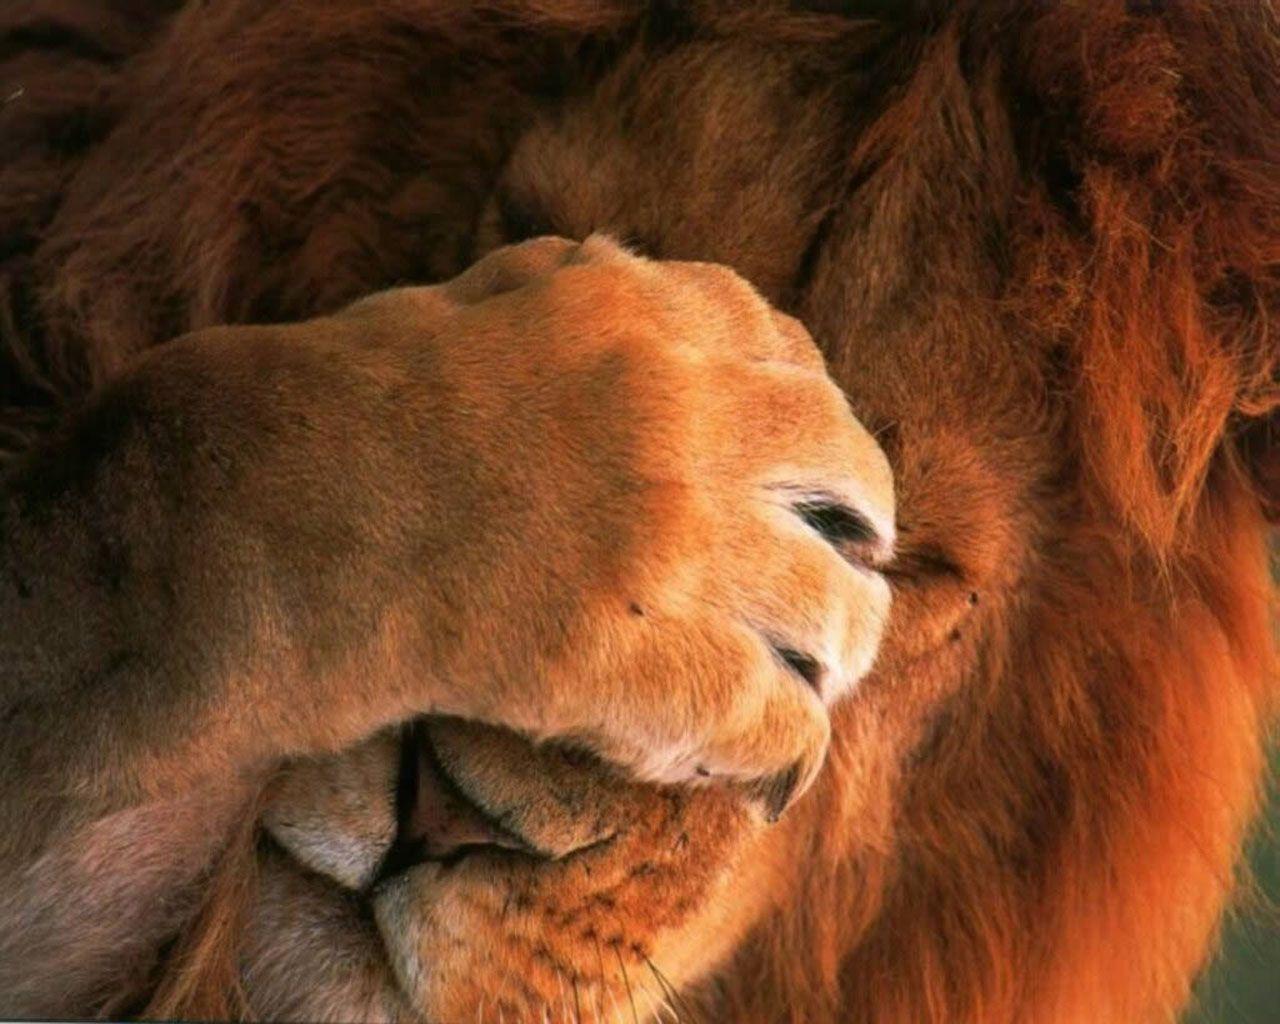 Lion wallpapers page crazy frankenstein download wallpaper